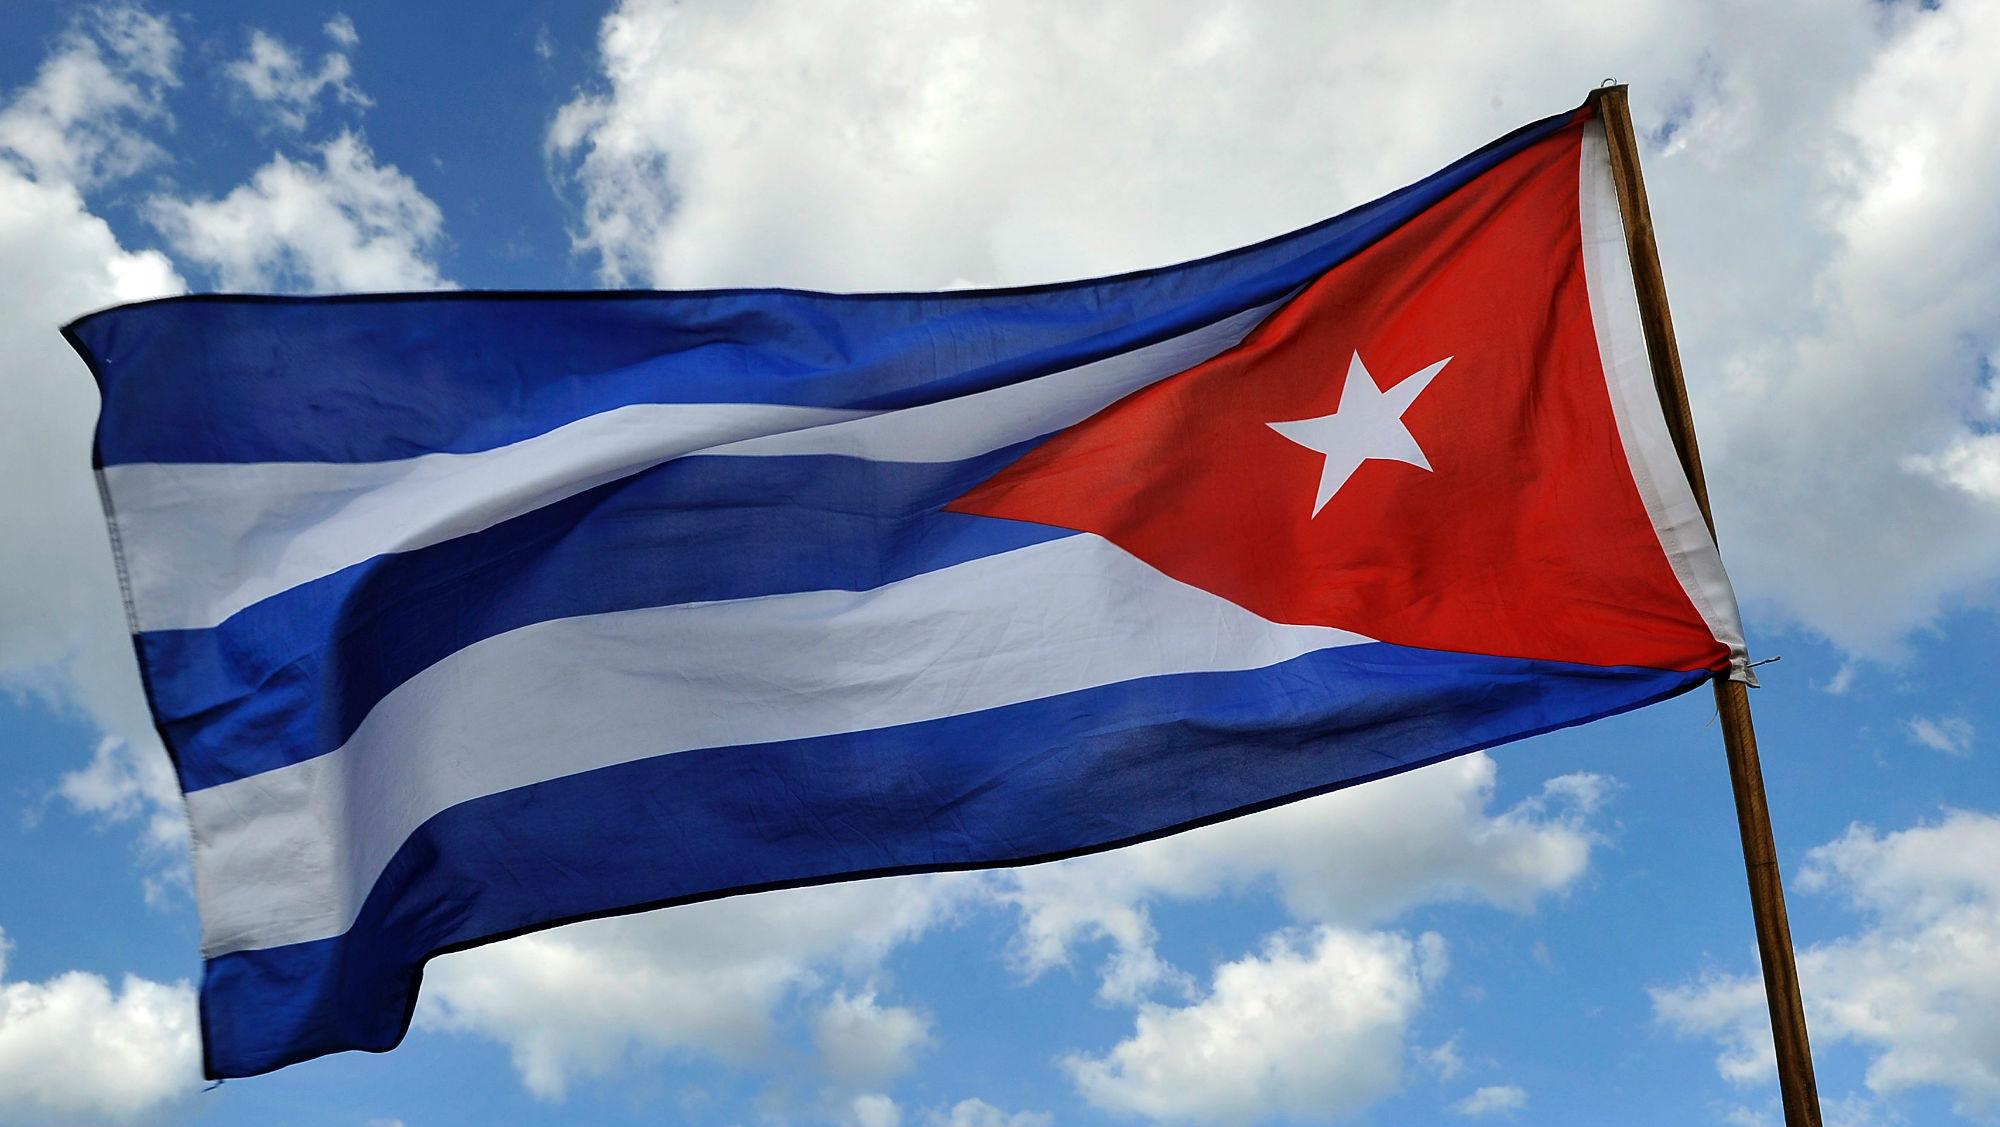 Cuba Is on the Clock